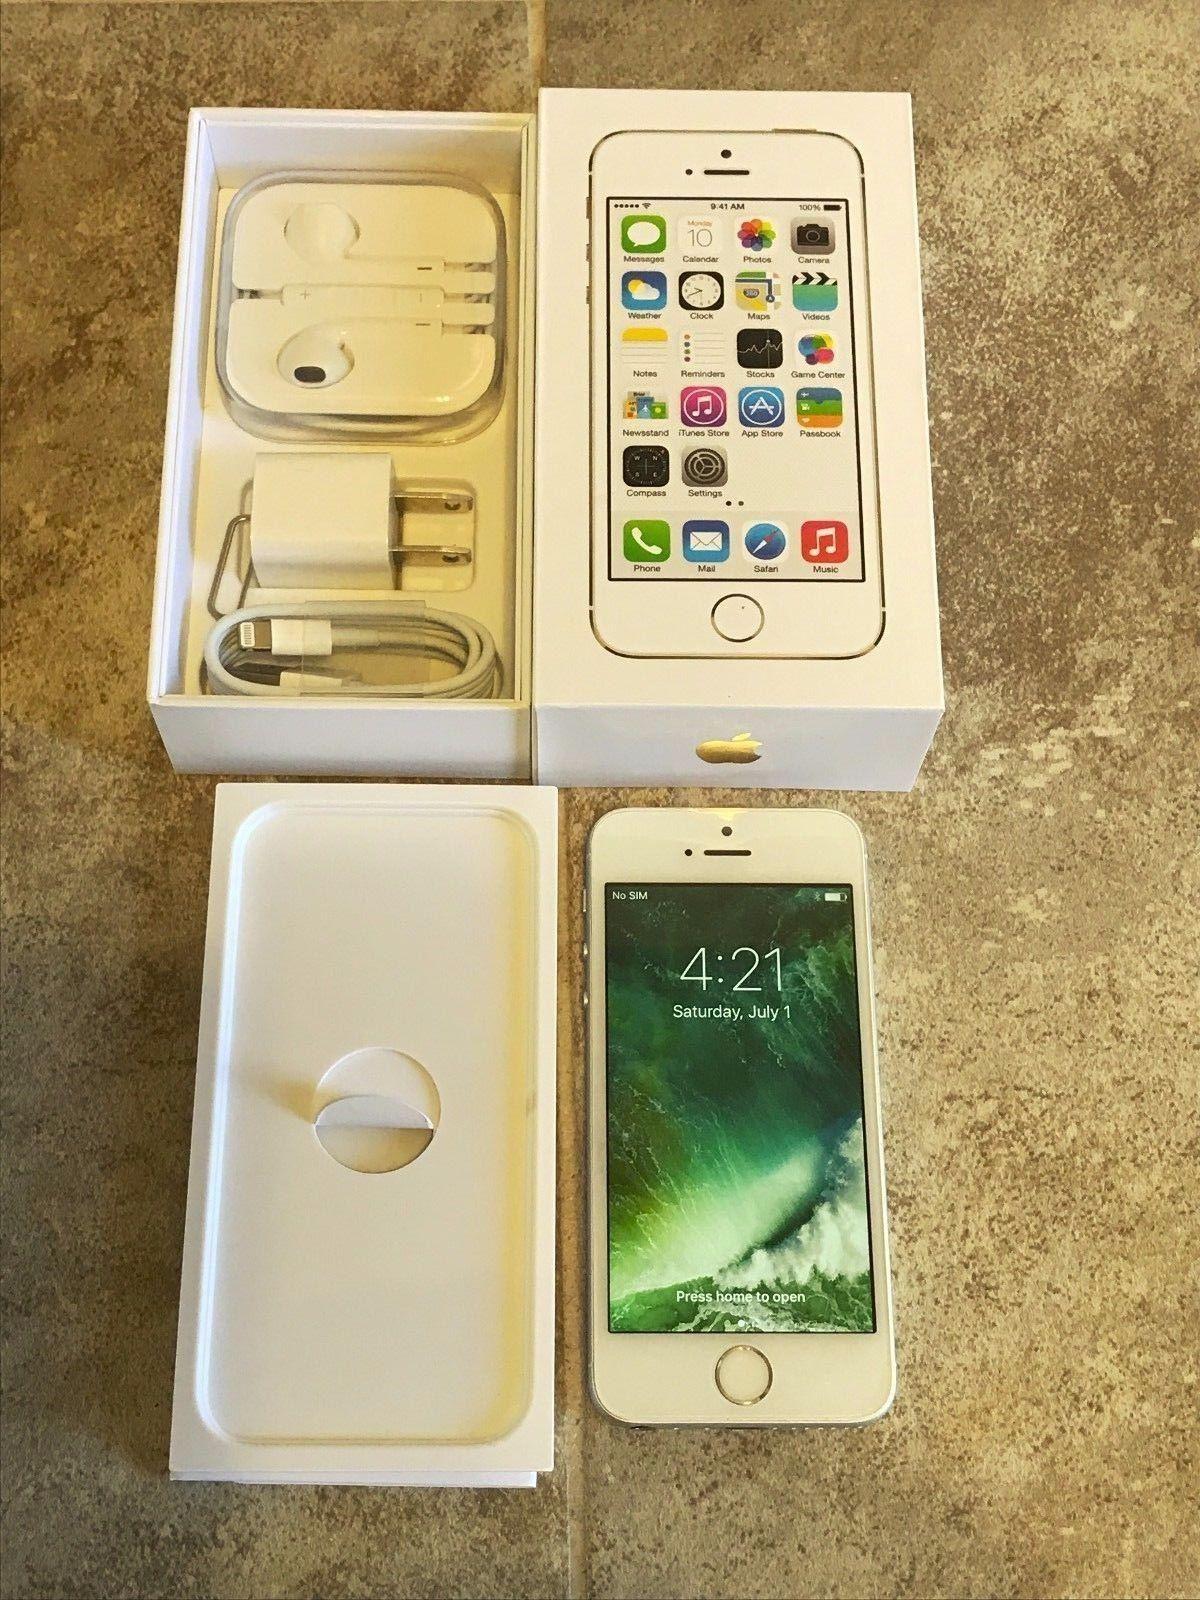 Apple iphone 5s iphone 6 mini 16gb white factory